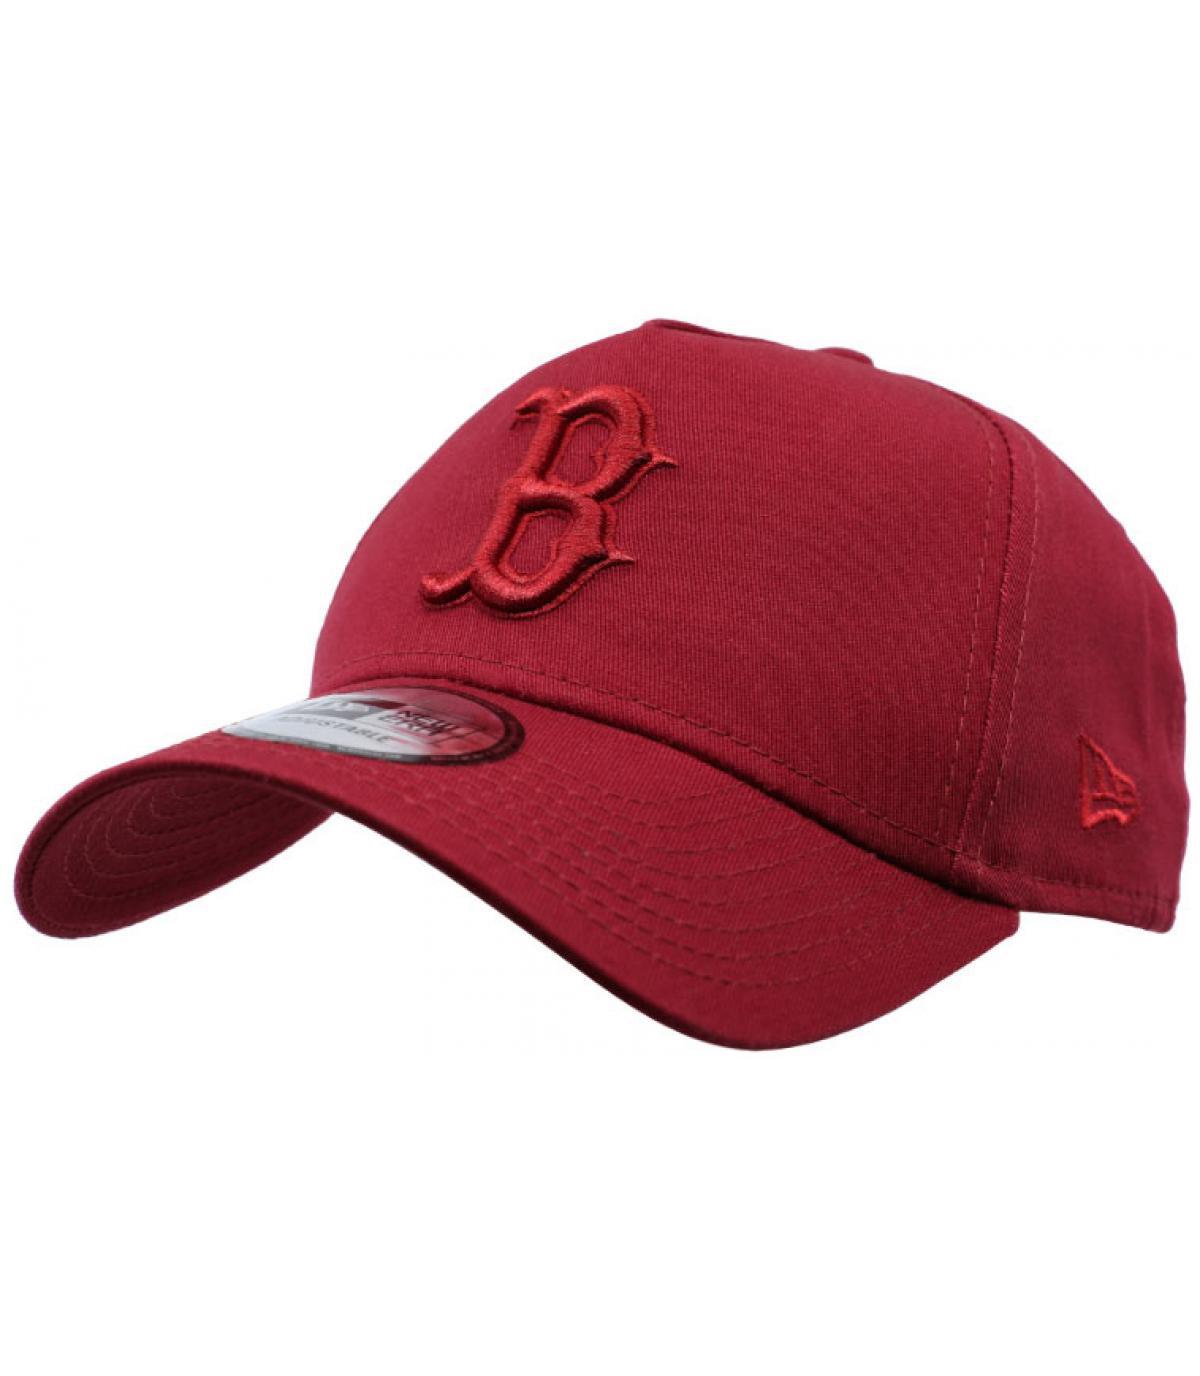 Details League Ess Boston Aframe cardinal - afbeeling 2